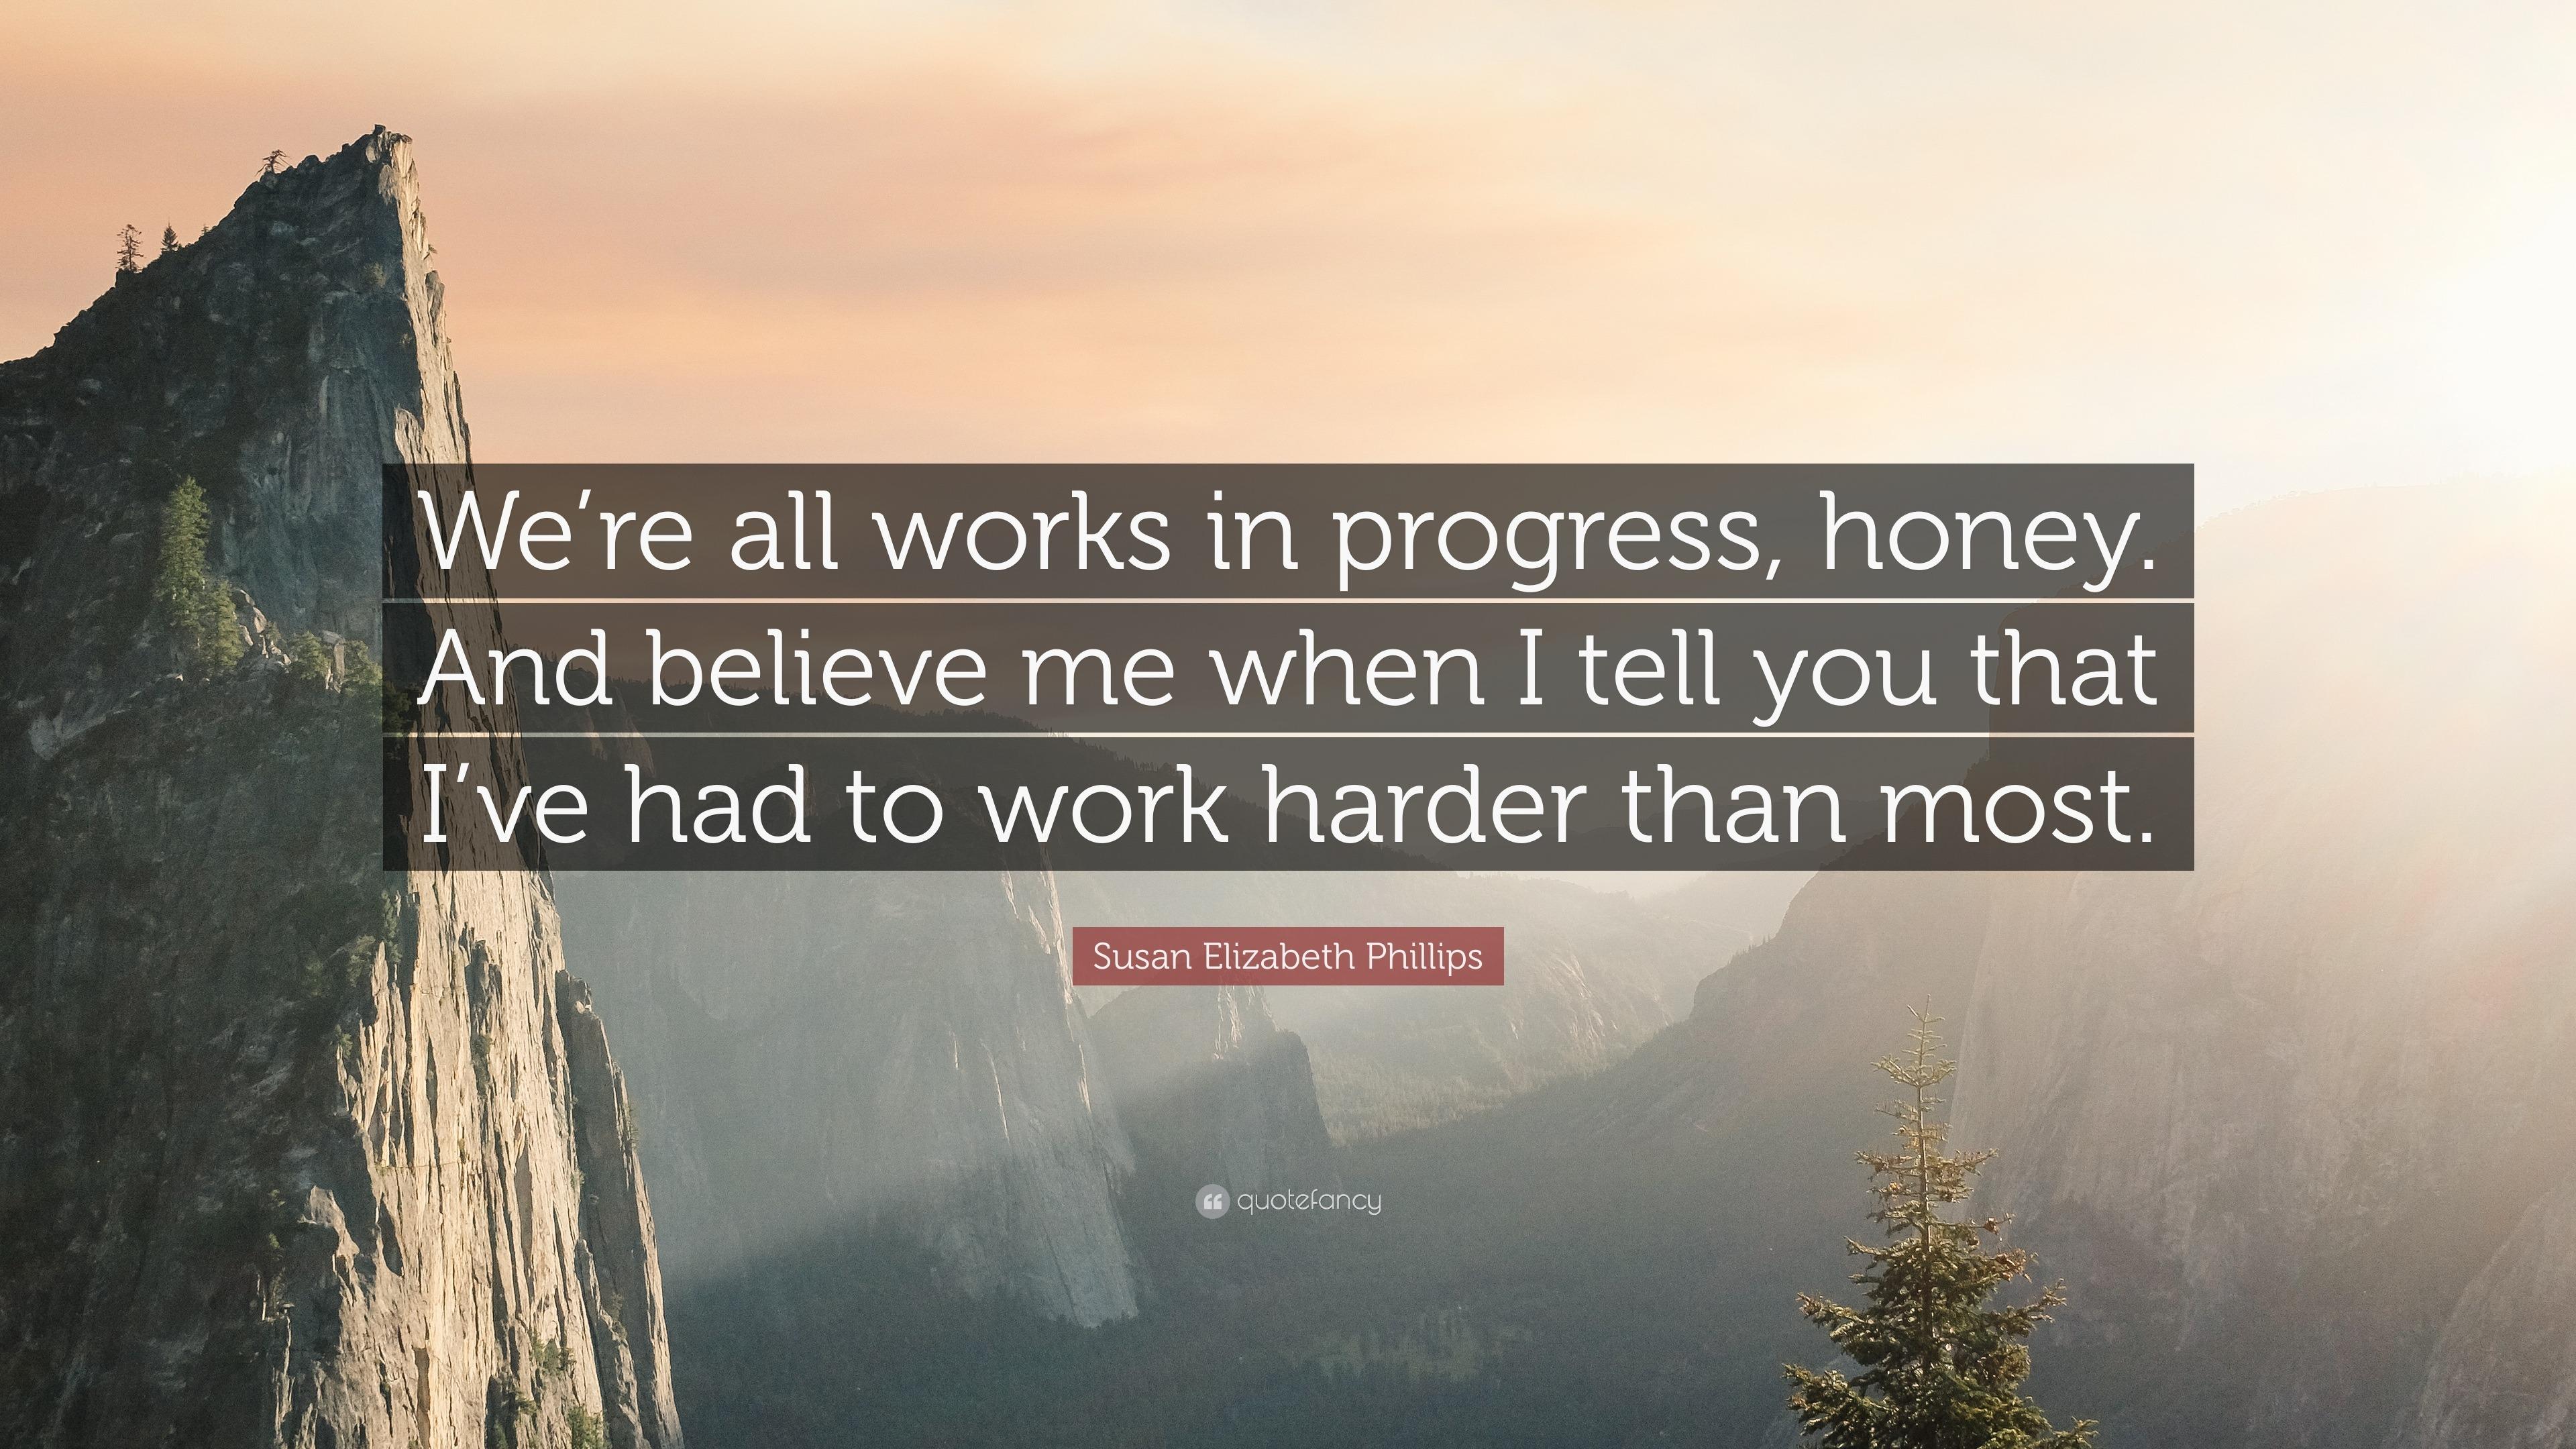 Image of: Sorry Honey Susan Elizabeth Phillips Quote were All Works In Progress Honey Quotefancy Susan Elizabeth Phillips Quote were All Works In Progress Honey